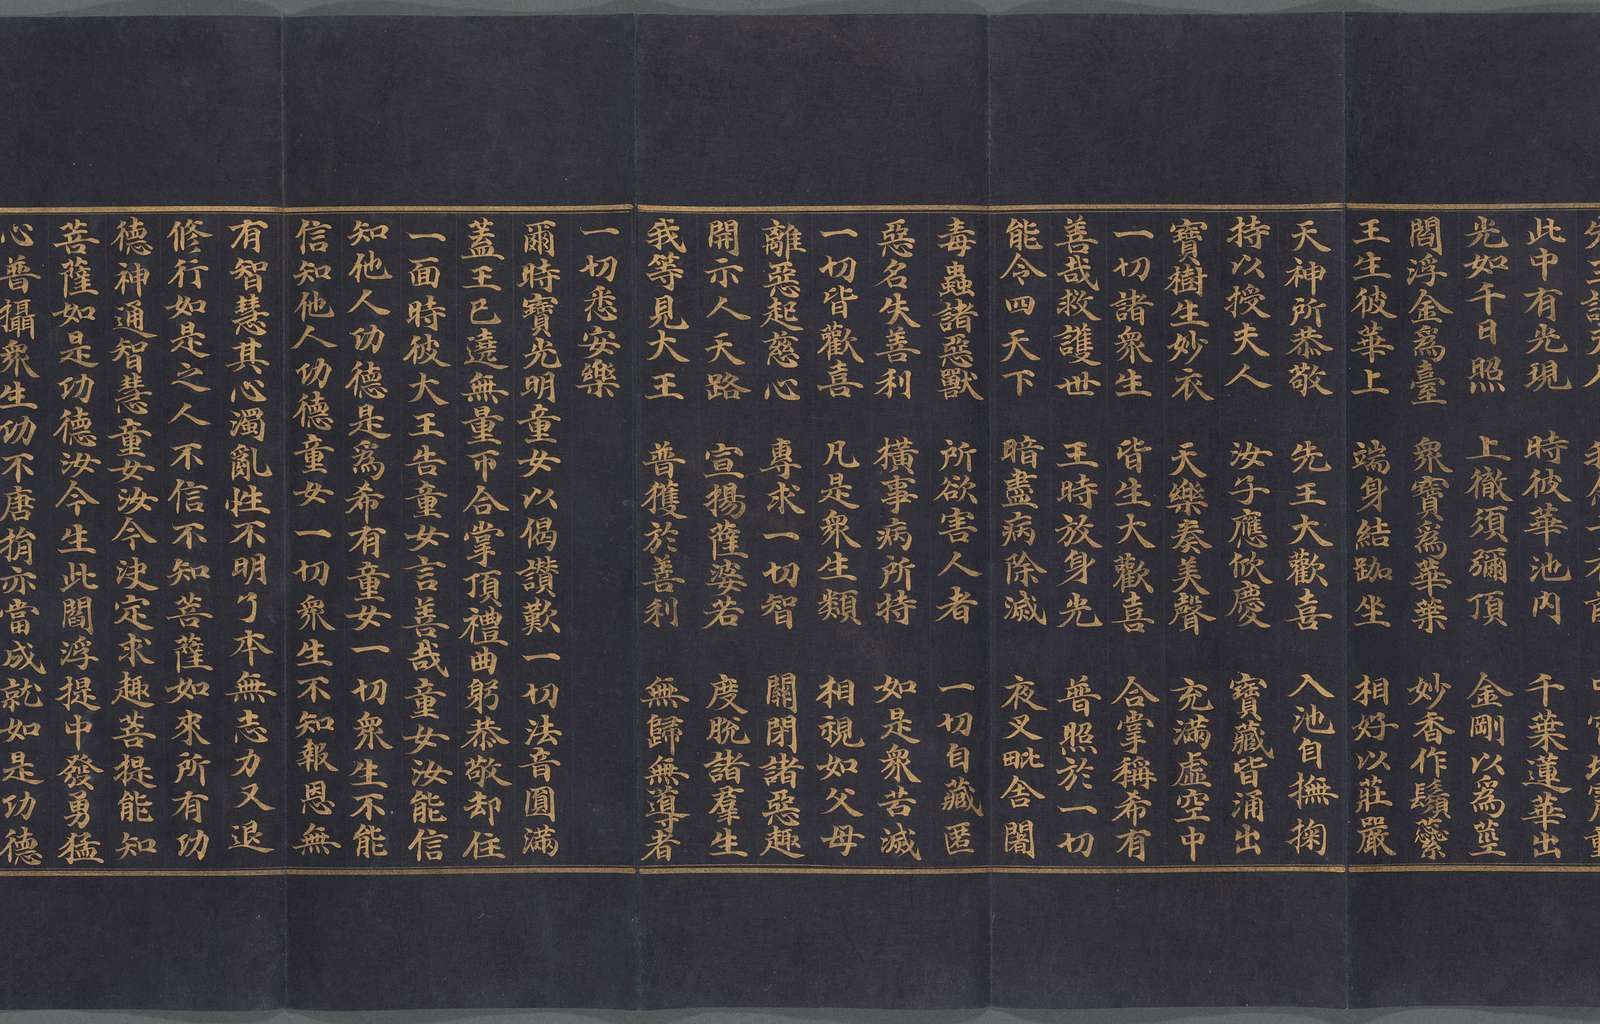 Tripiṭaka. Sūtrapiṭaka. Avataṃsakasūtra. Korean